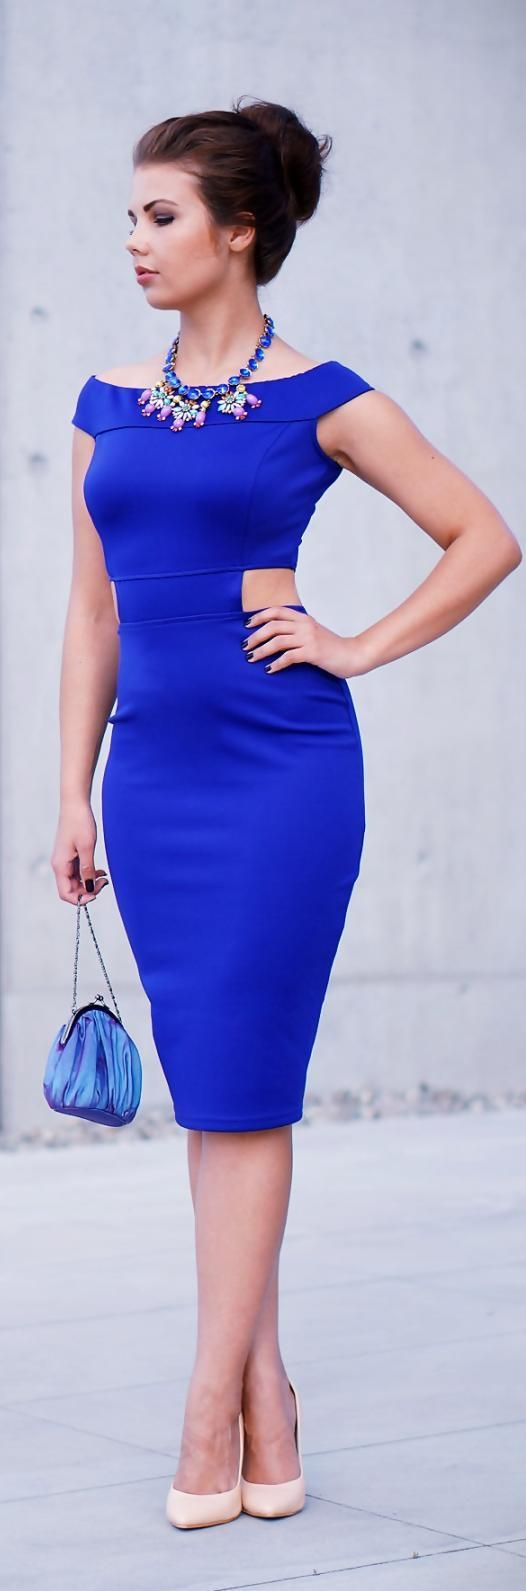 BLUE MIDI DRESS    http://www.apieceofanna.com/2013/09/blue-midi-dress.html